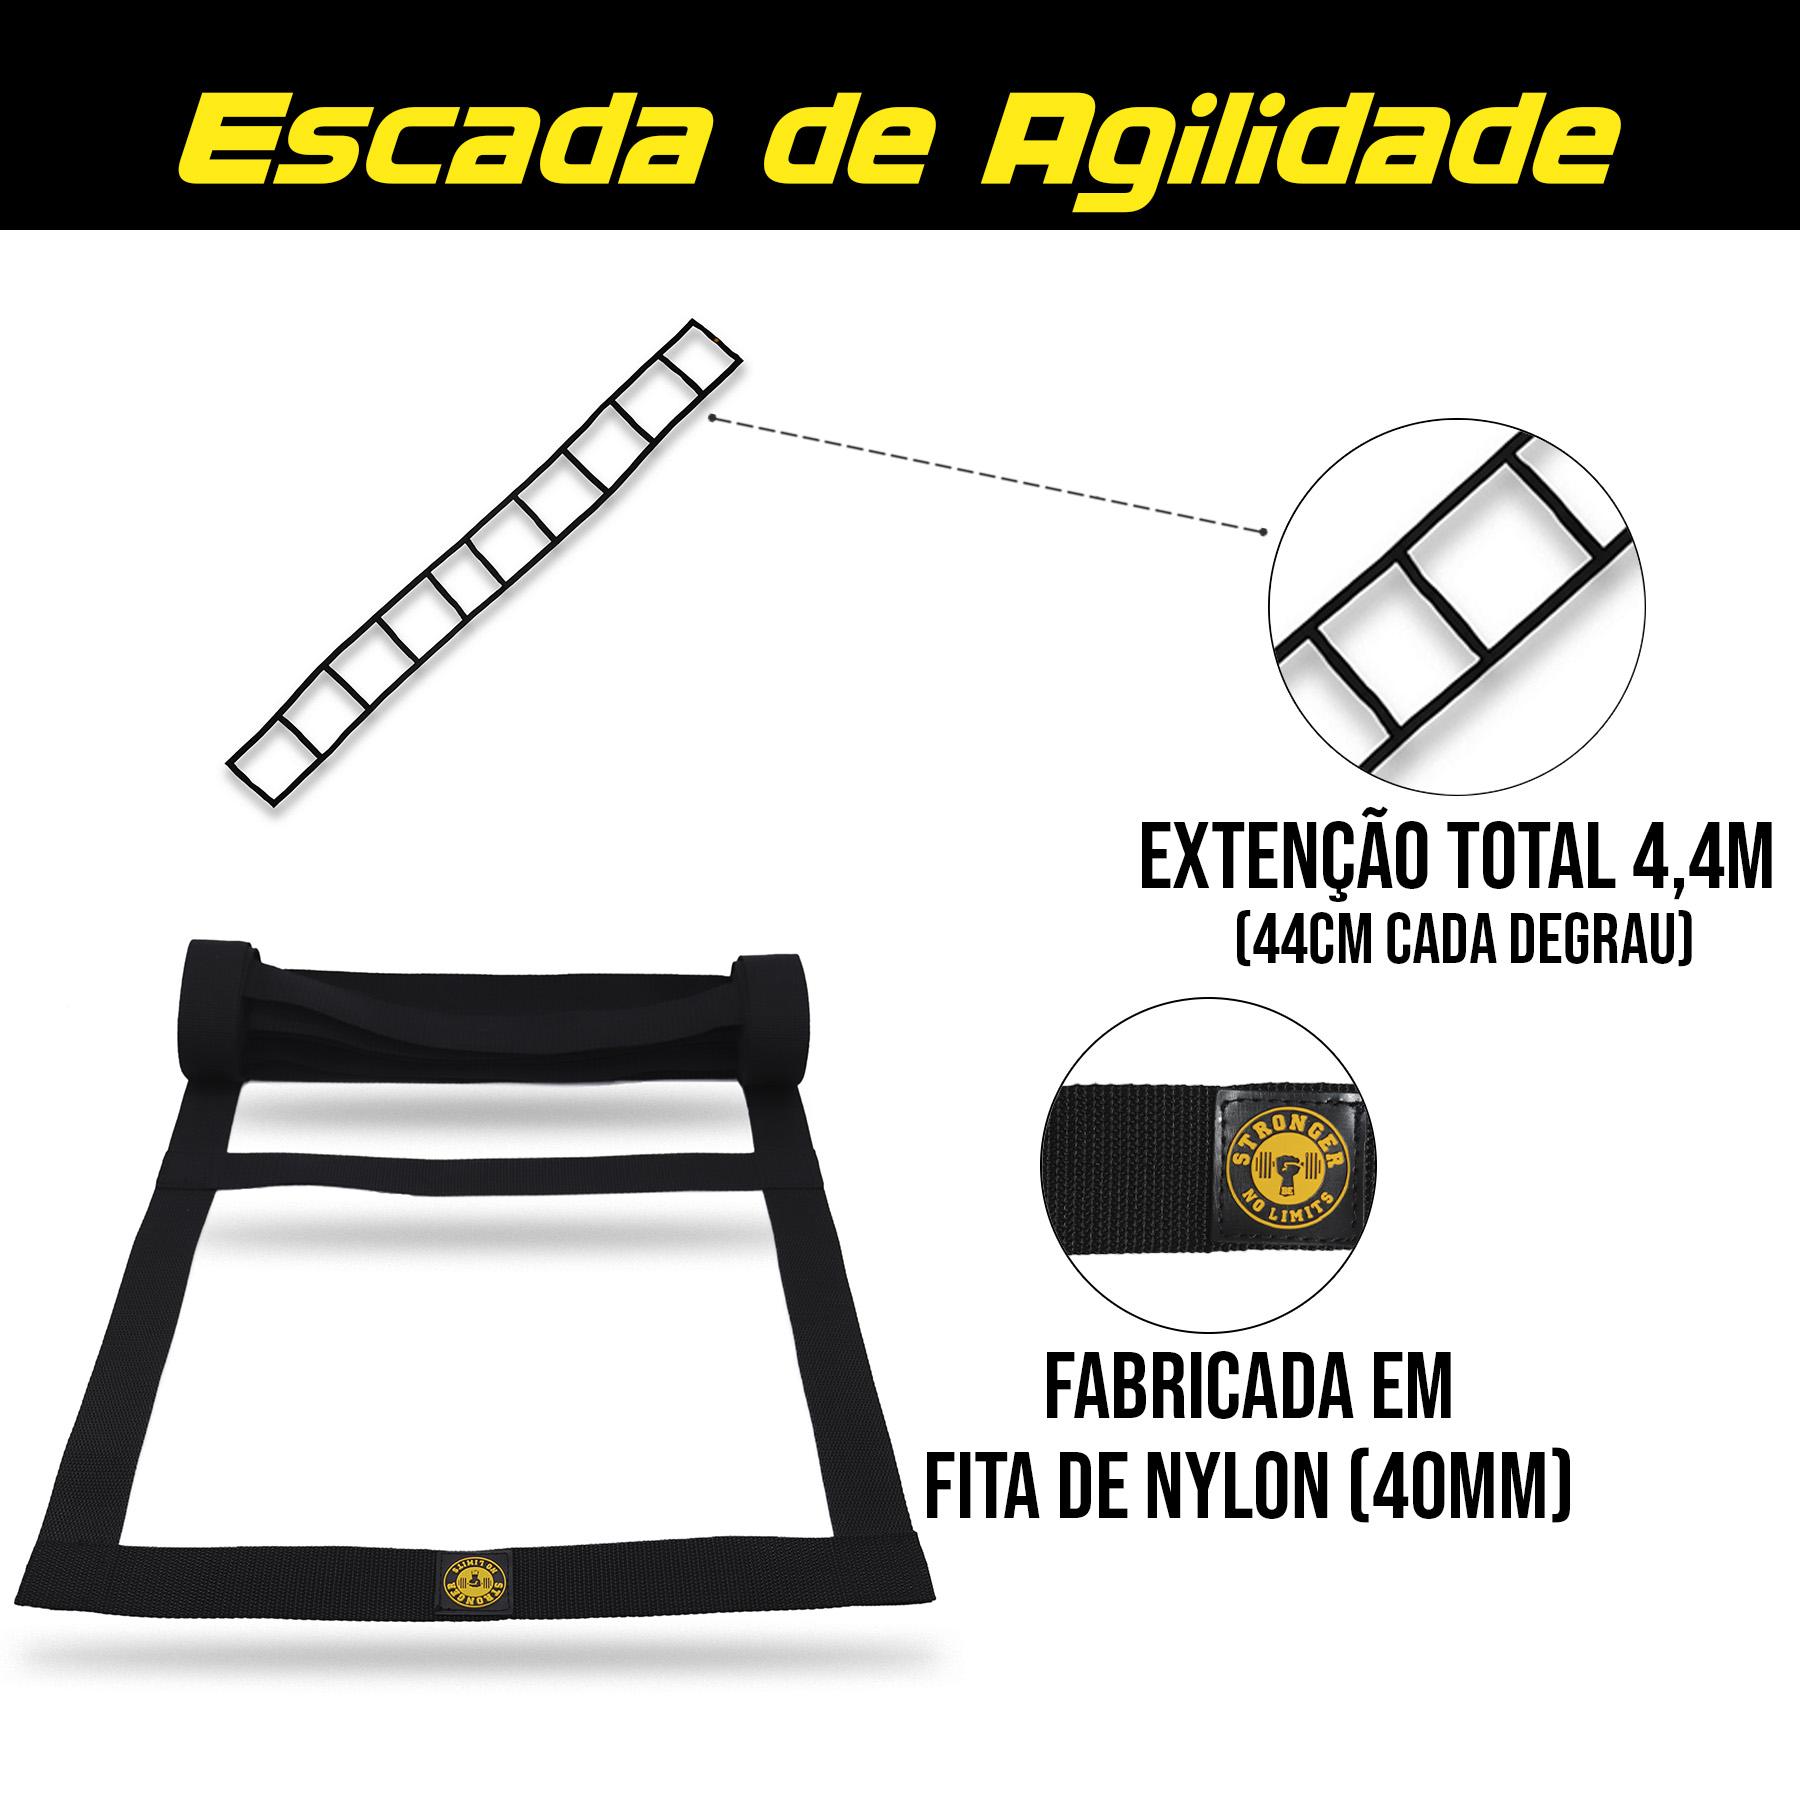 Kit Funcional - Escada de agilidade + Corda de pular + Cones de agilidade